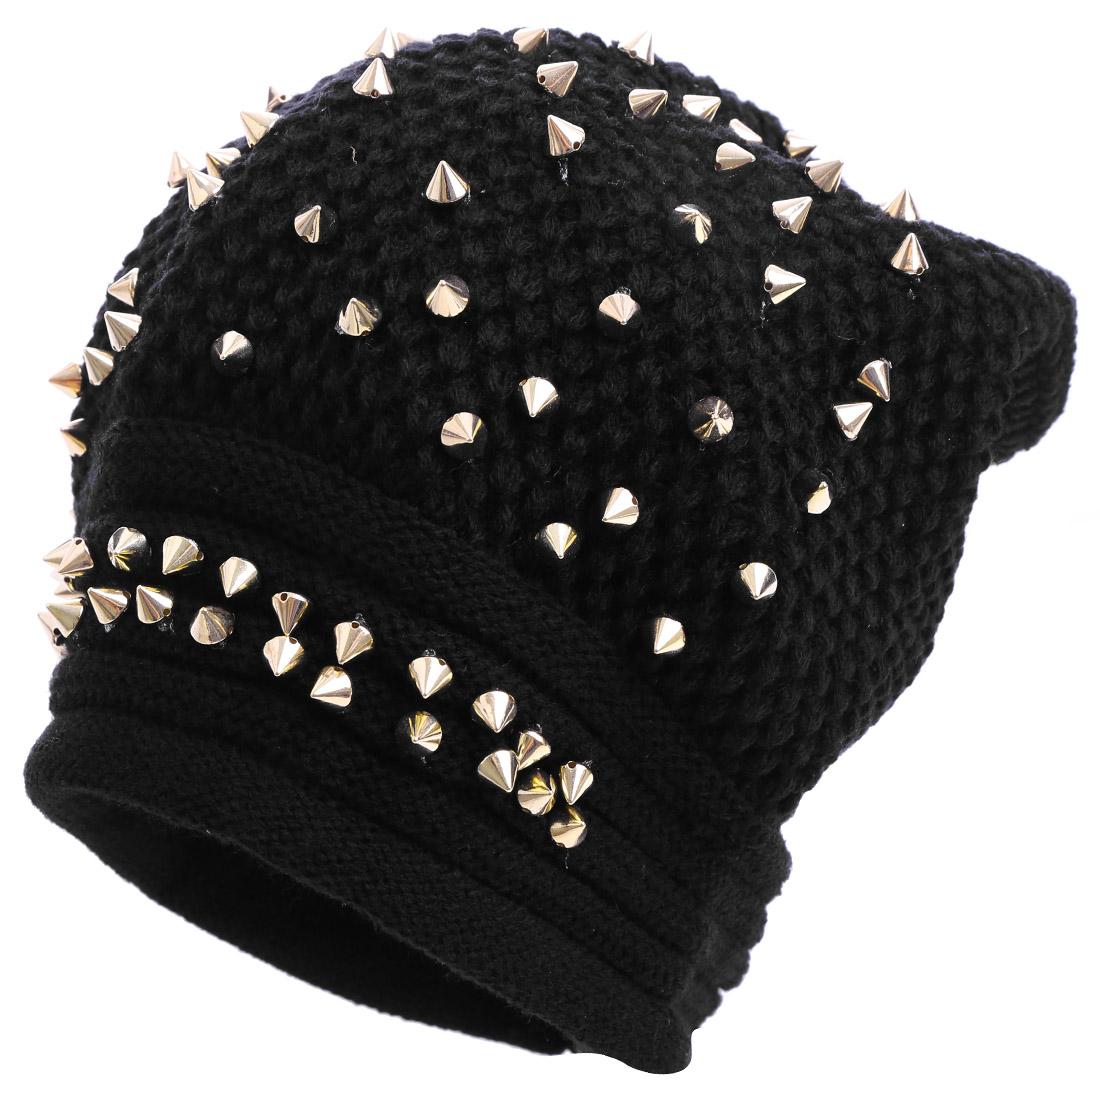 Men Stretchy Studs Decor Black Gold Tone Knit Beanie Hat